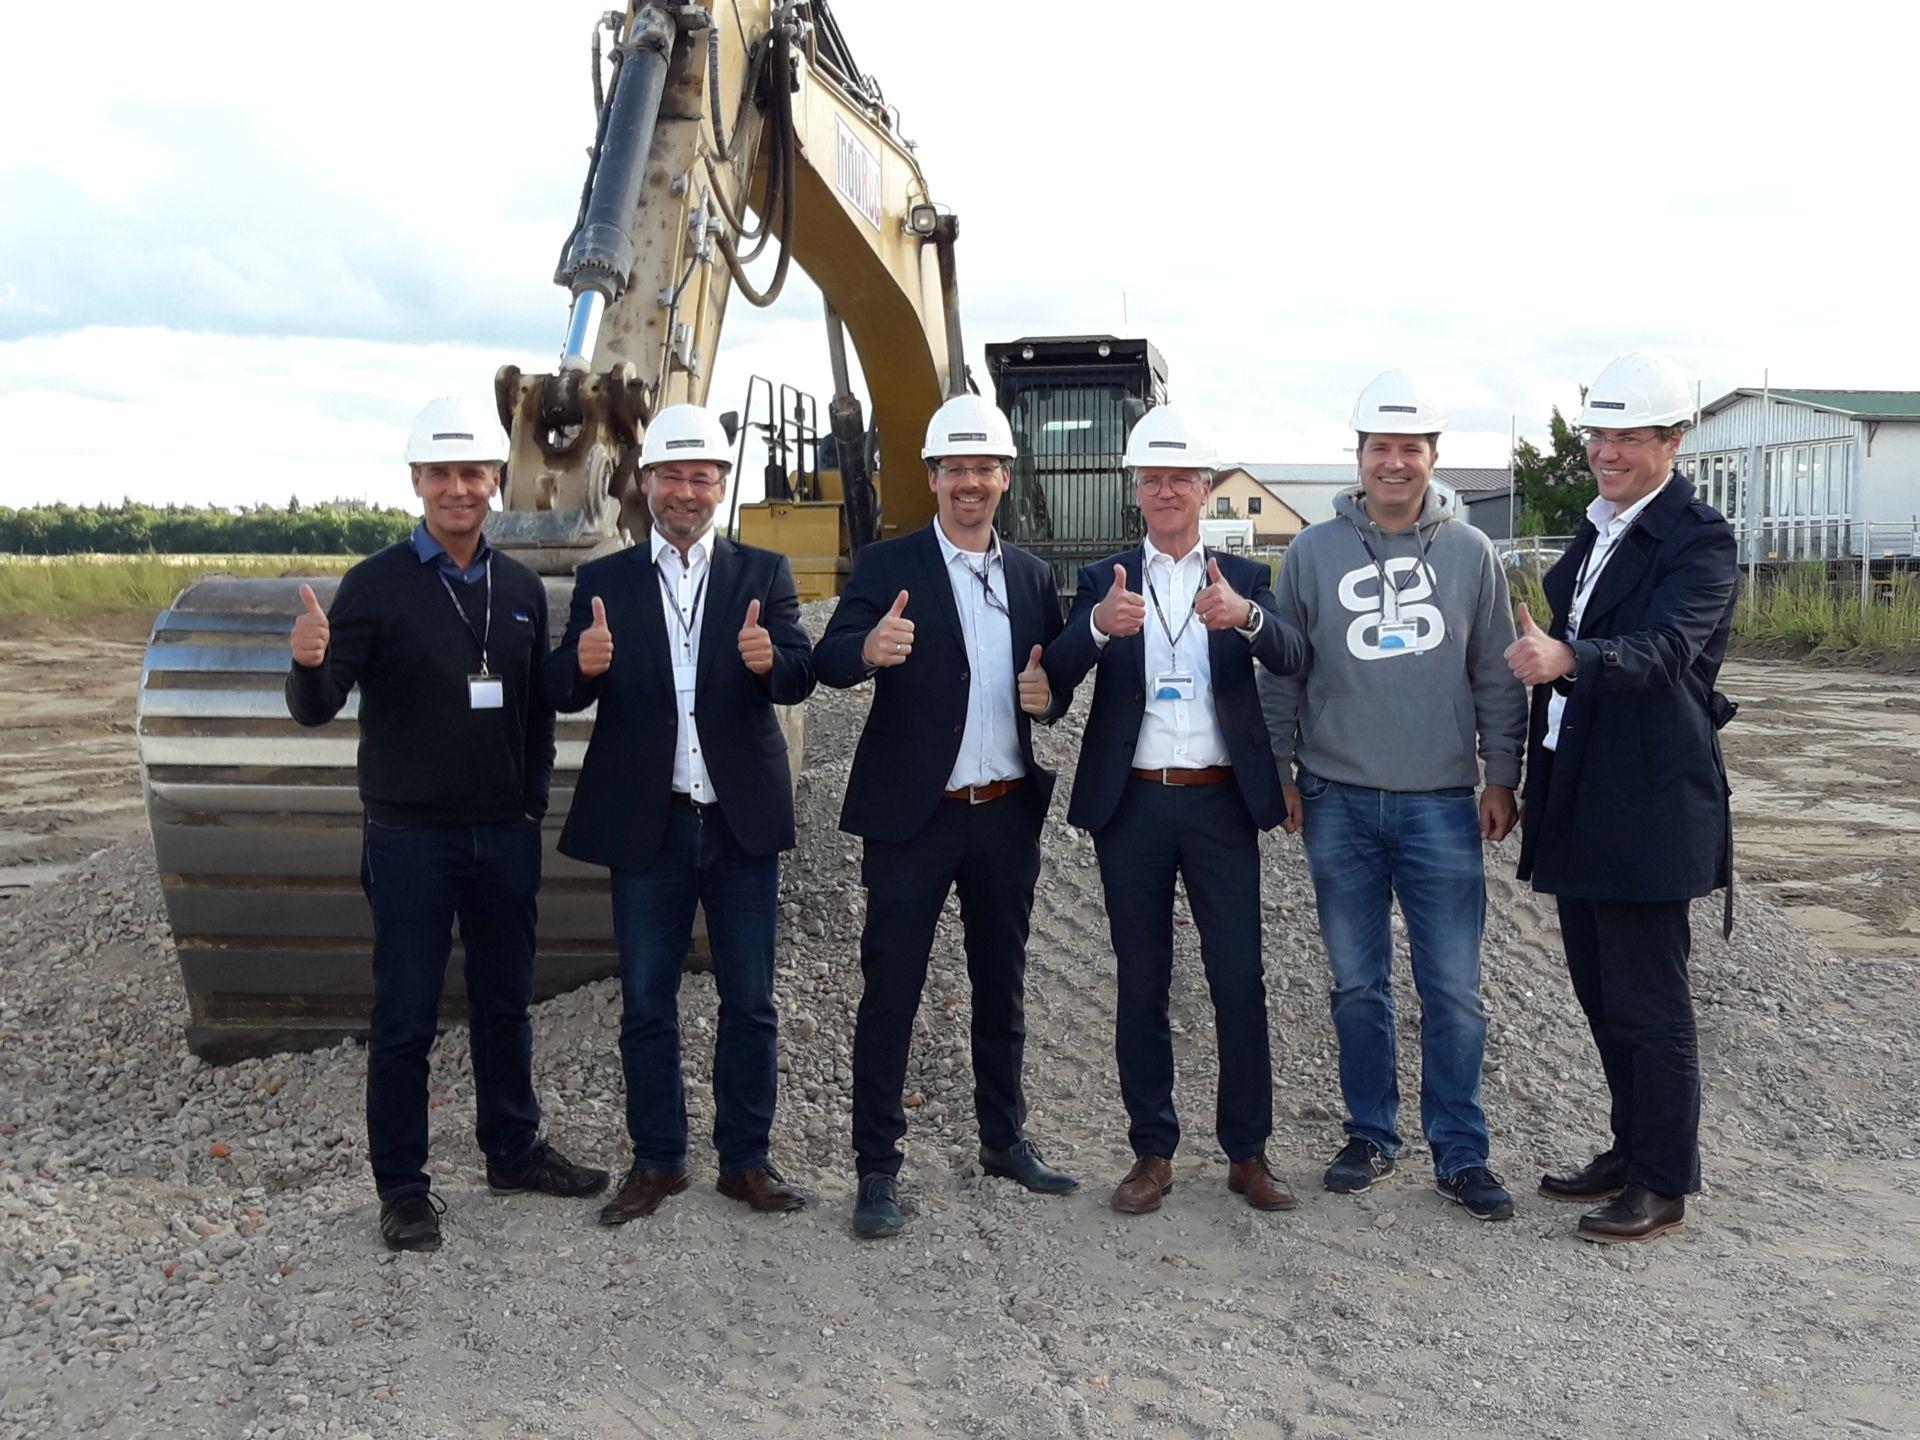 Baustellen-Sommerfest Panattoni Europe in Ketsch